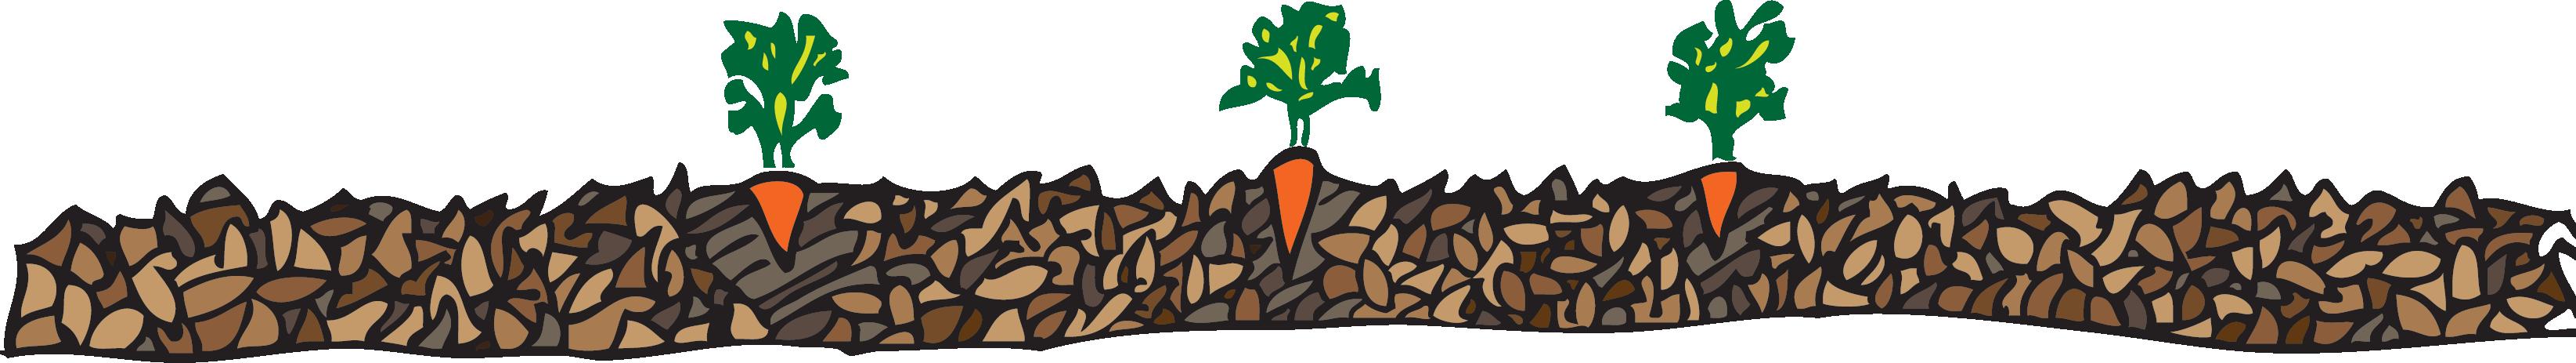 Gardener clipart vegetable patch. Grow vegetables easily using